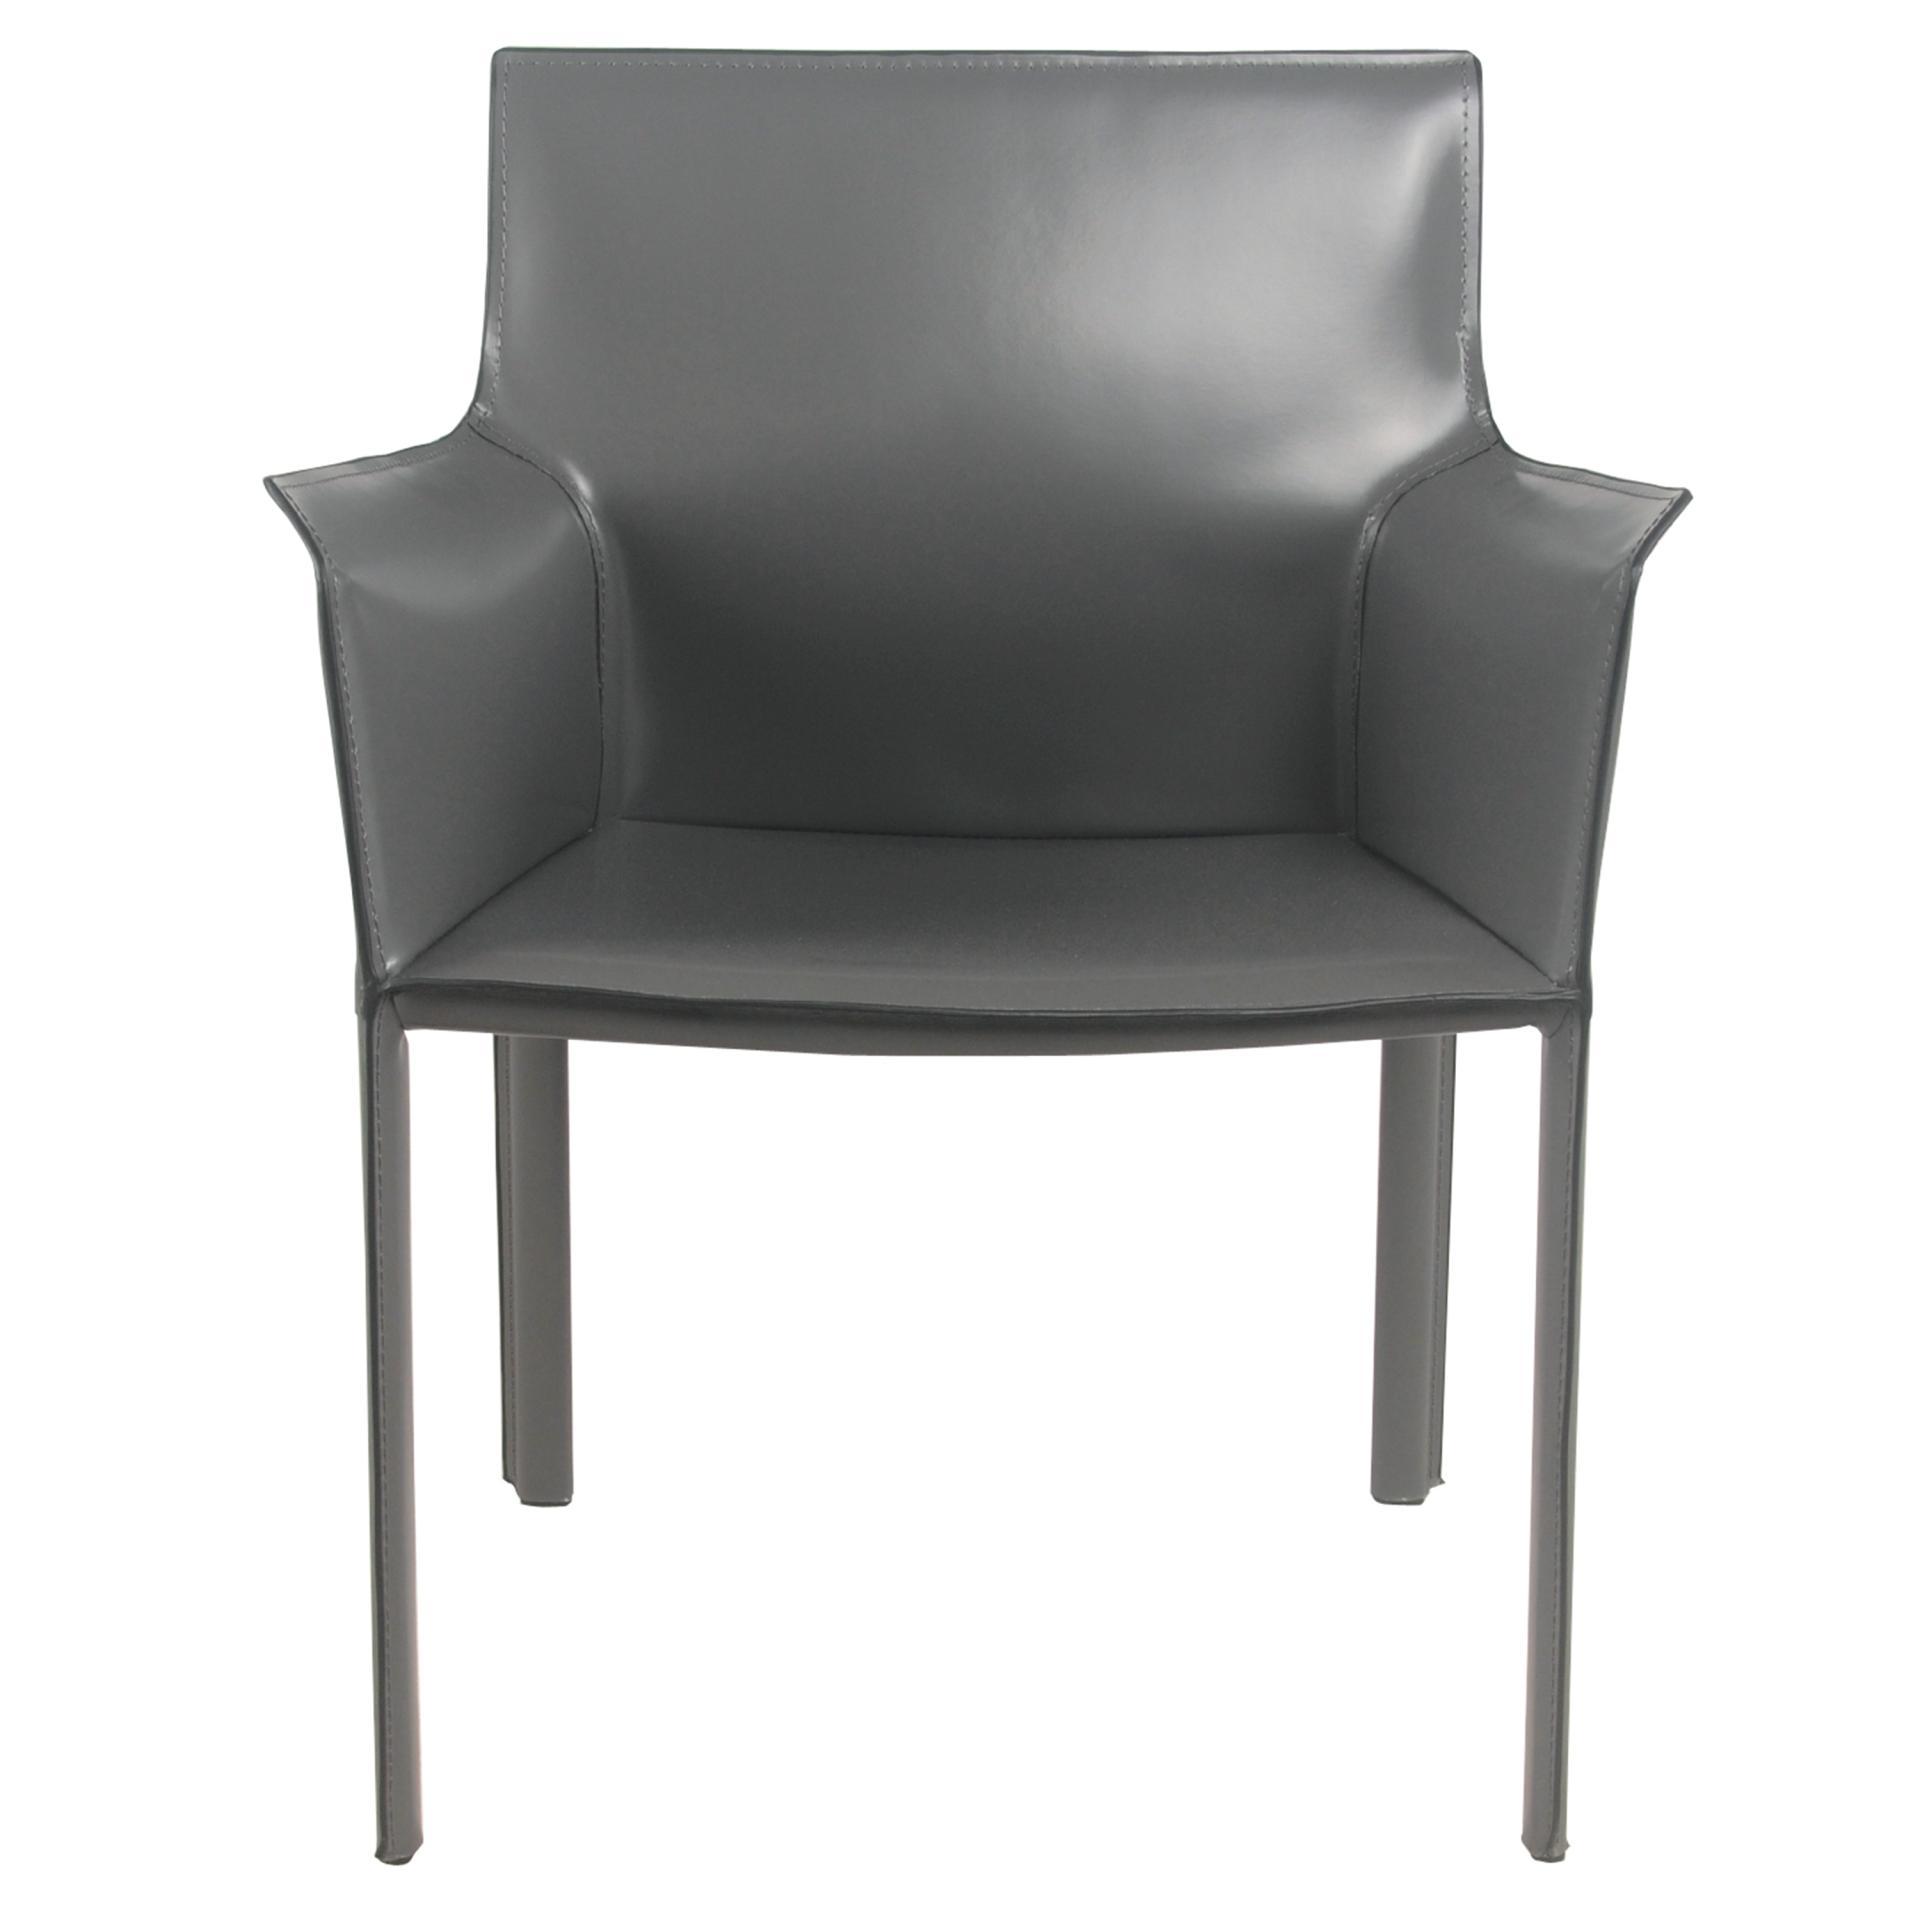 4400031 30 Npd Home Furniture Wholesale Lifestyle